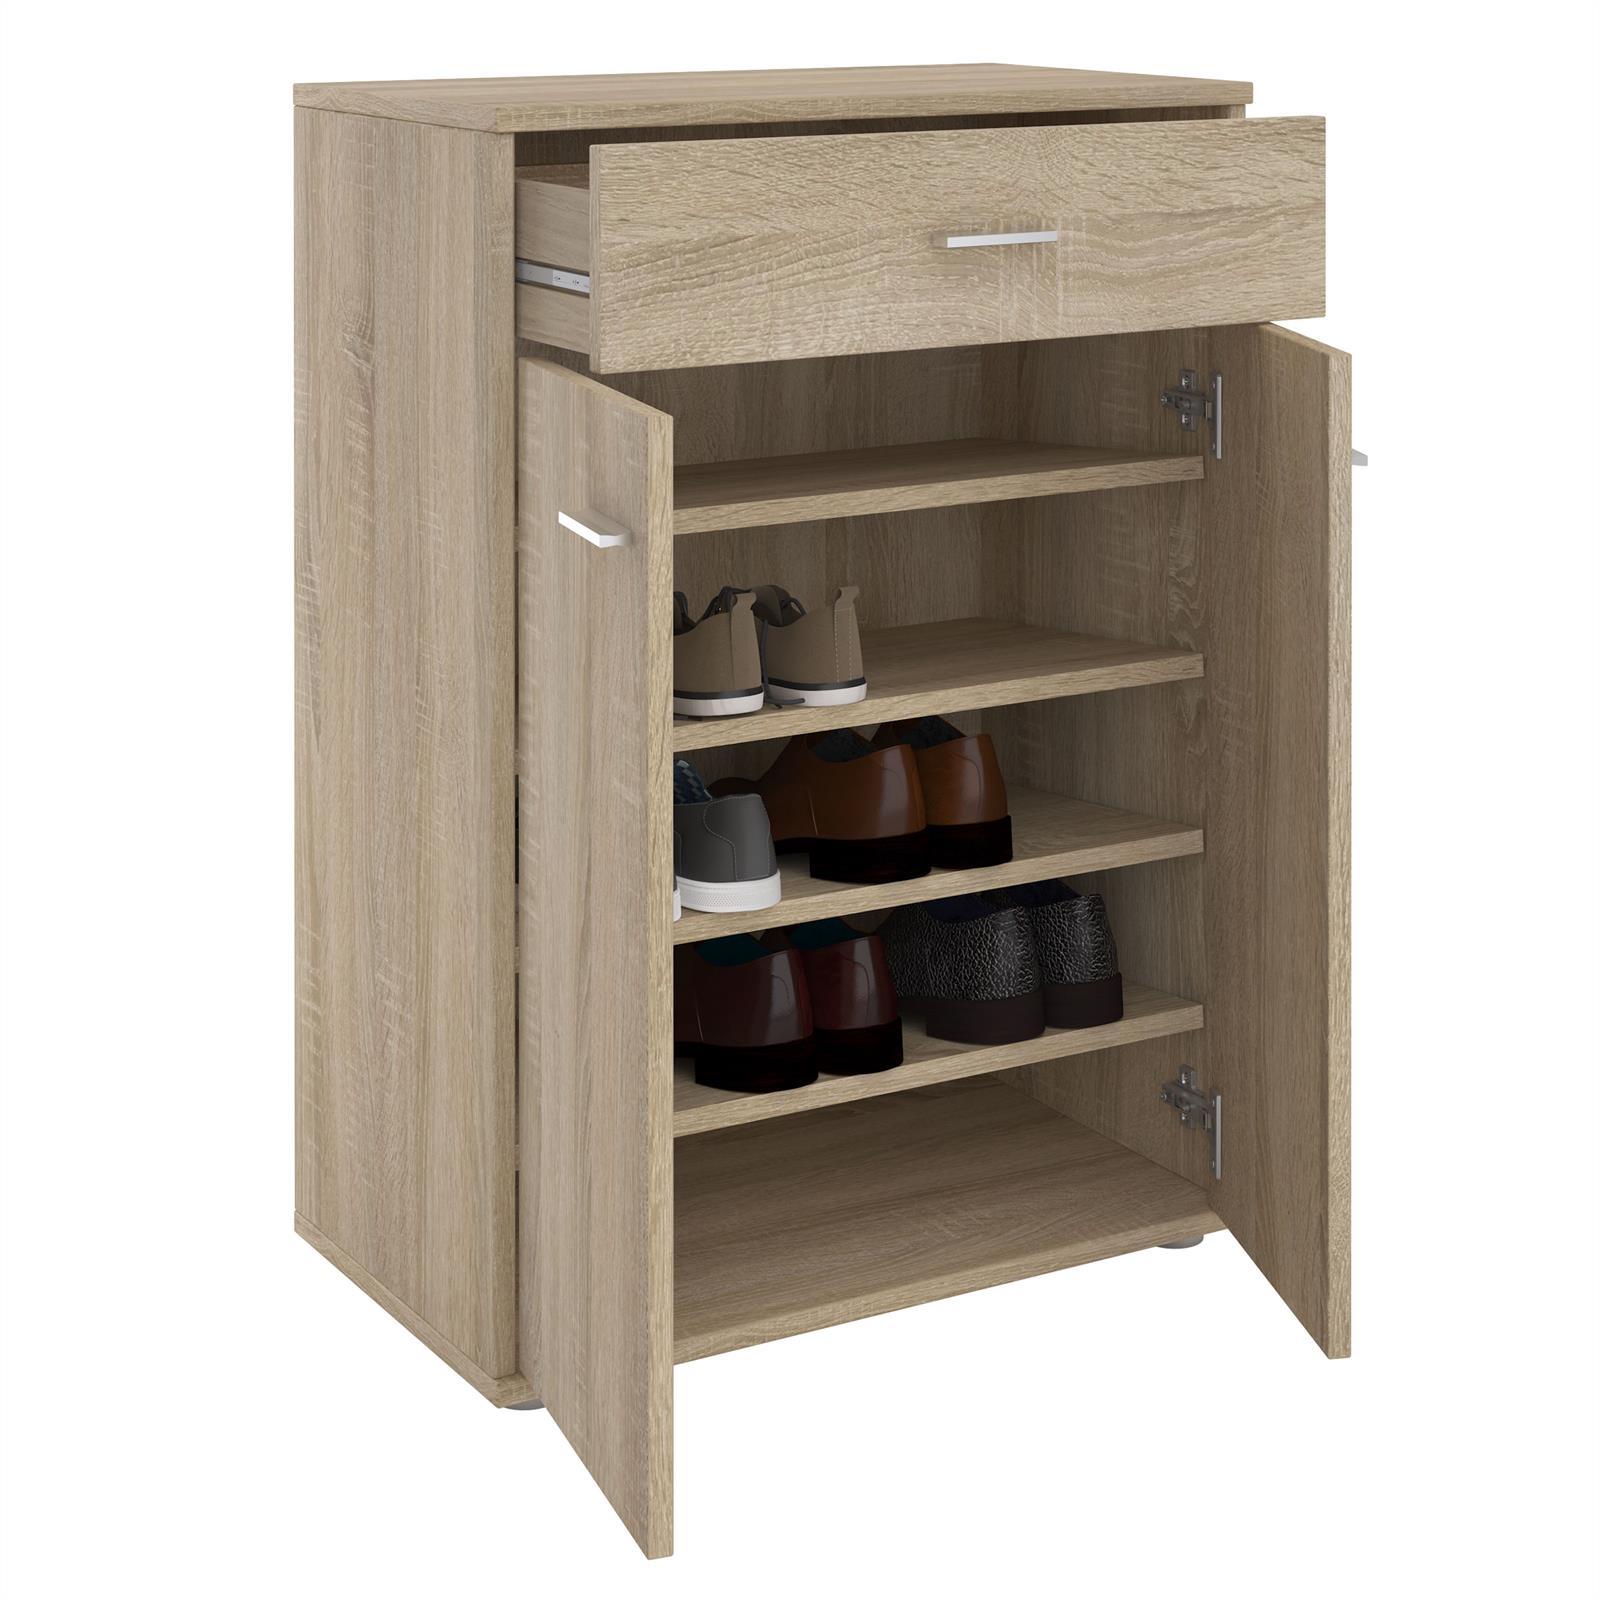 schuhschrank grenoble in sonoma eiche caro m bel. Black Bedroom Furniture Sets. Home Design Ideas